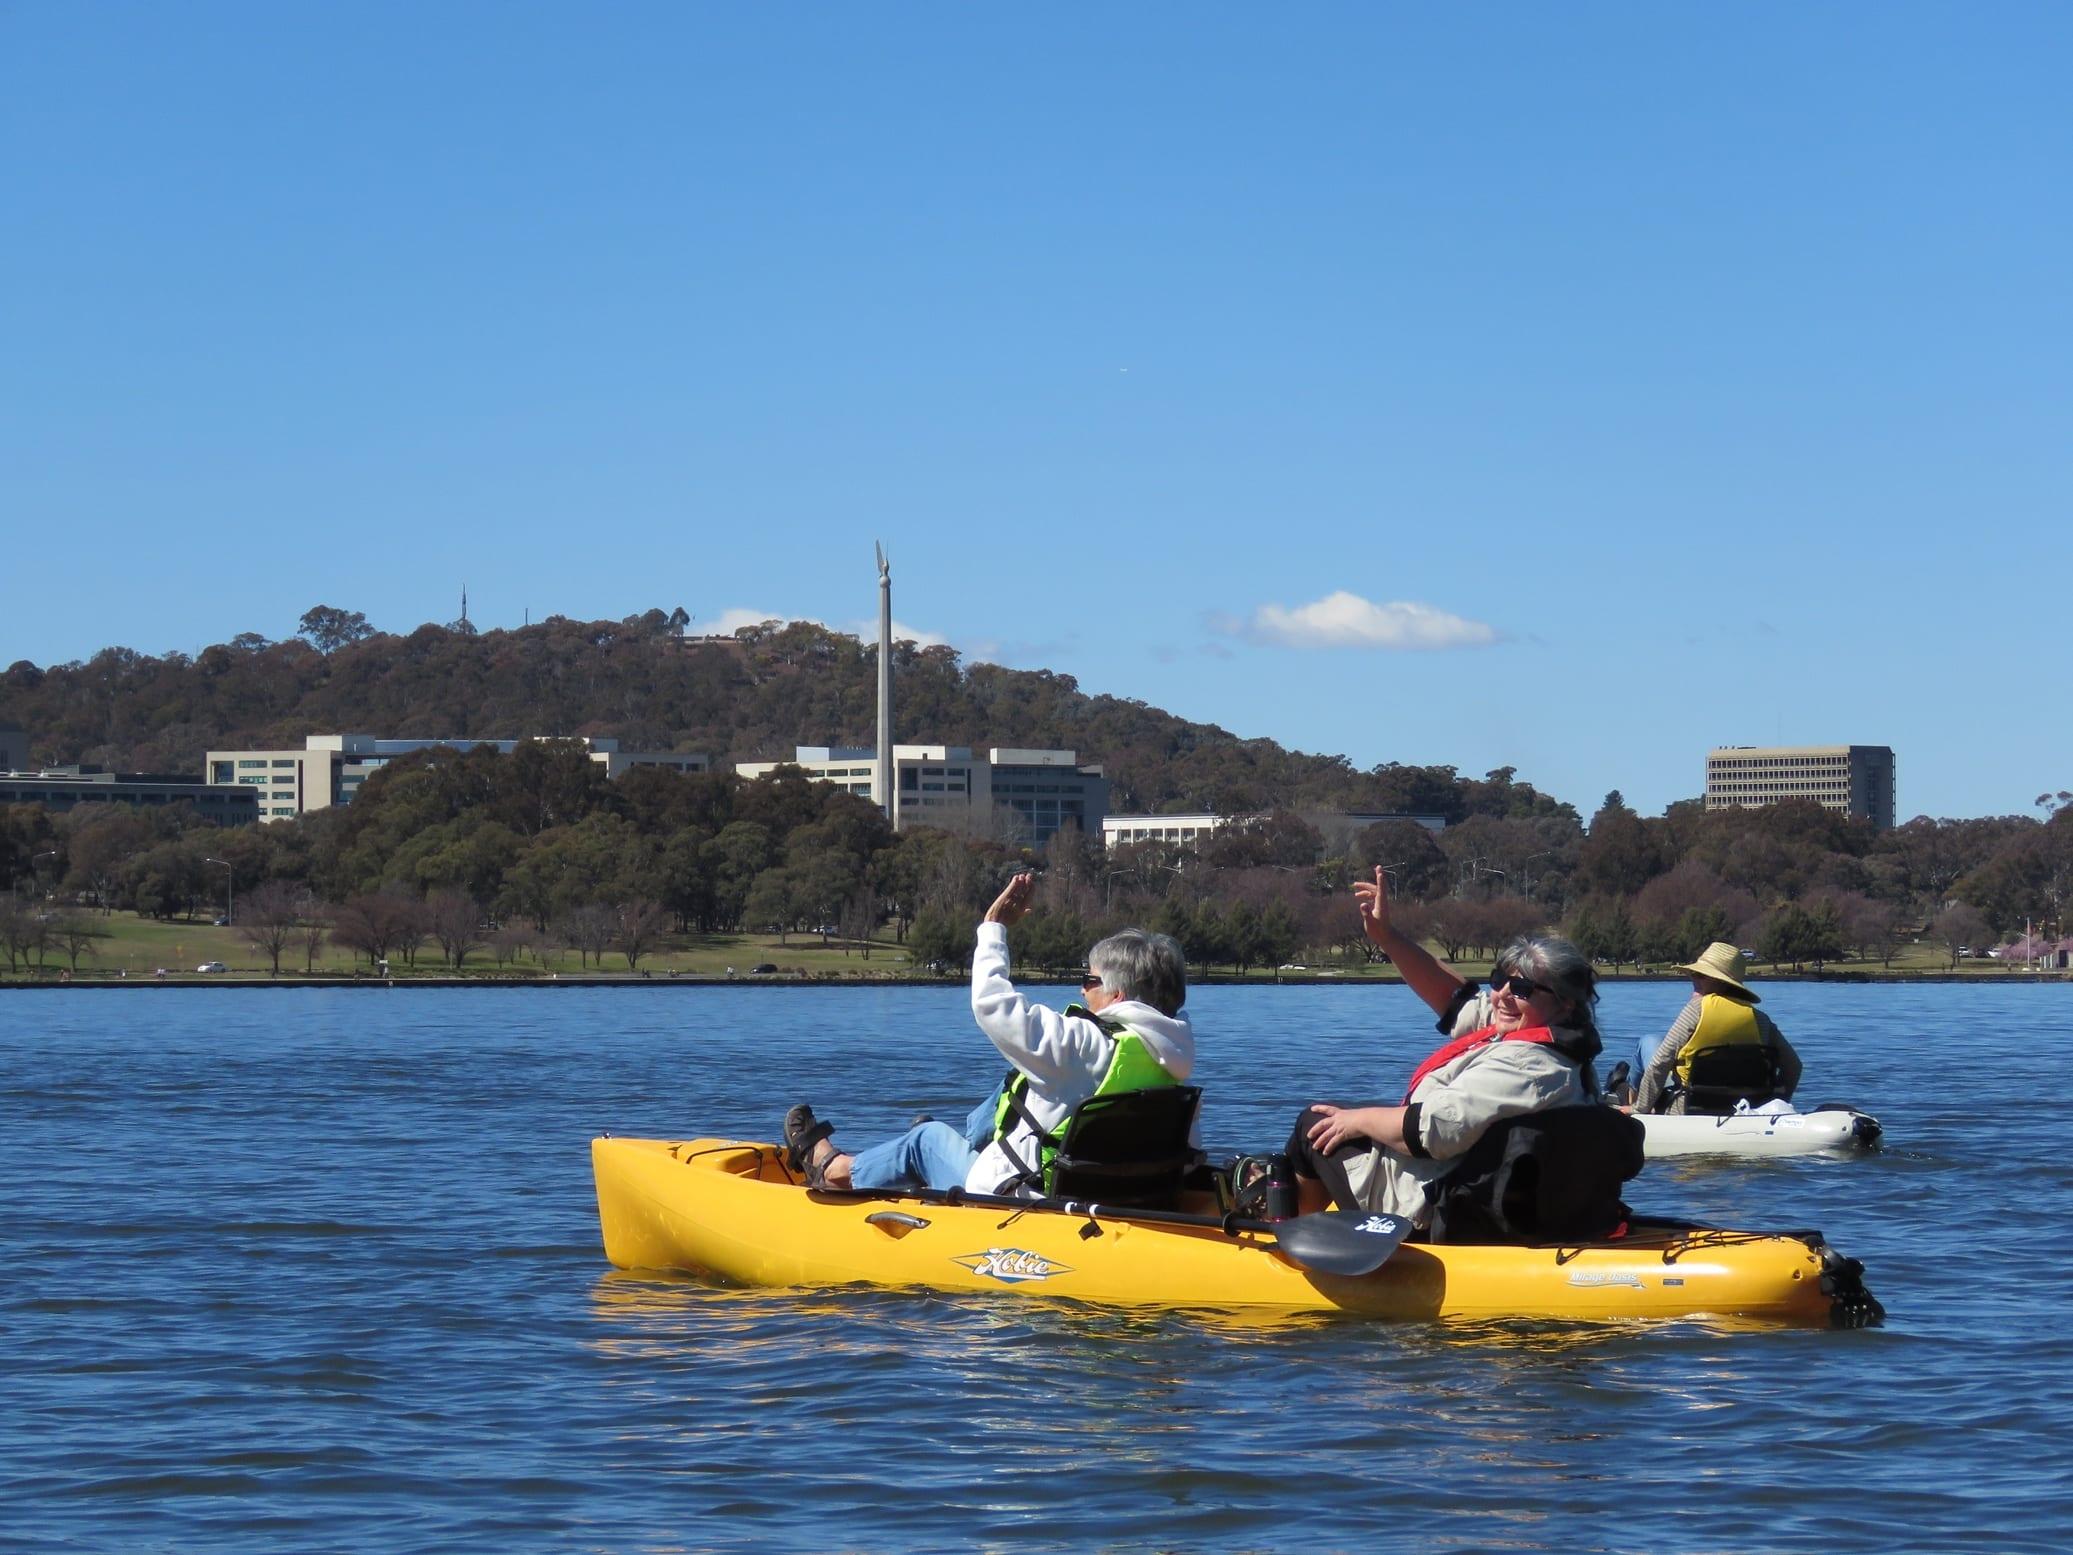 Kayaks canberra